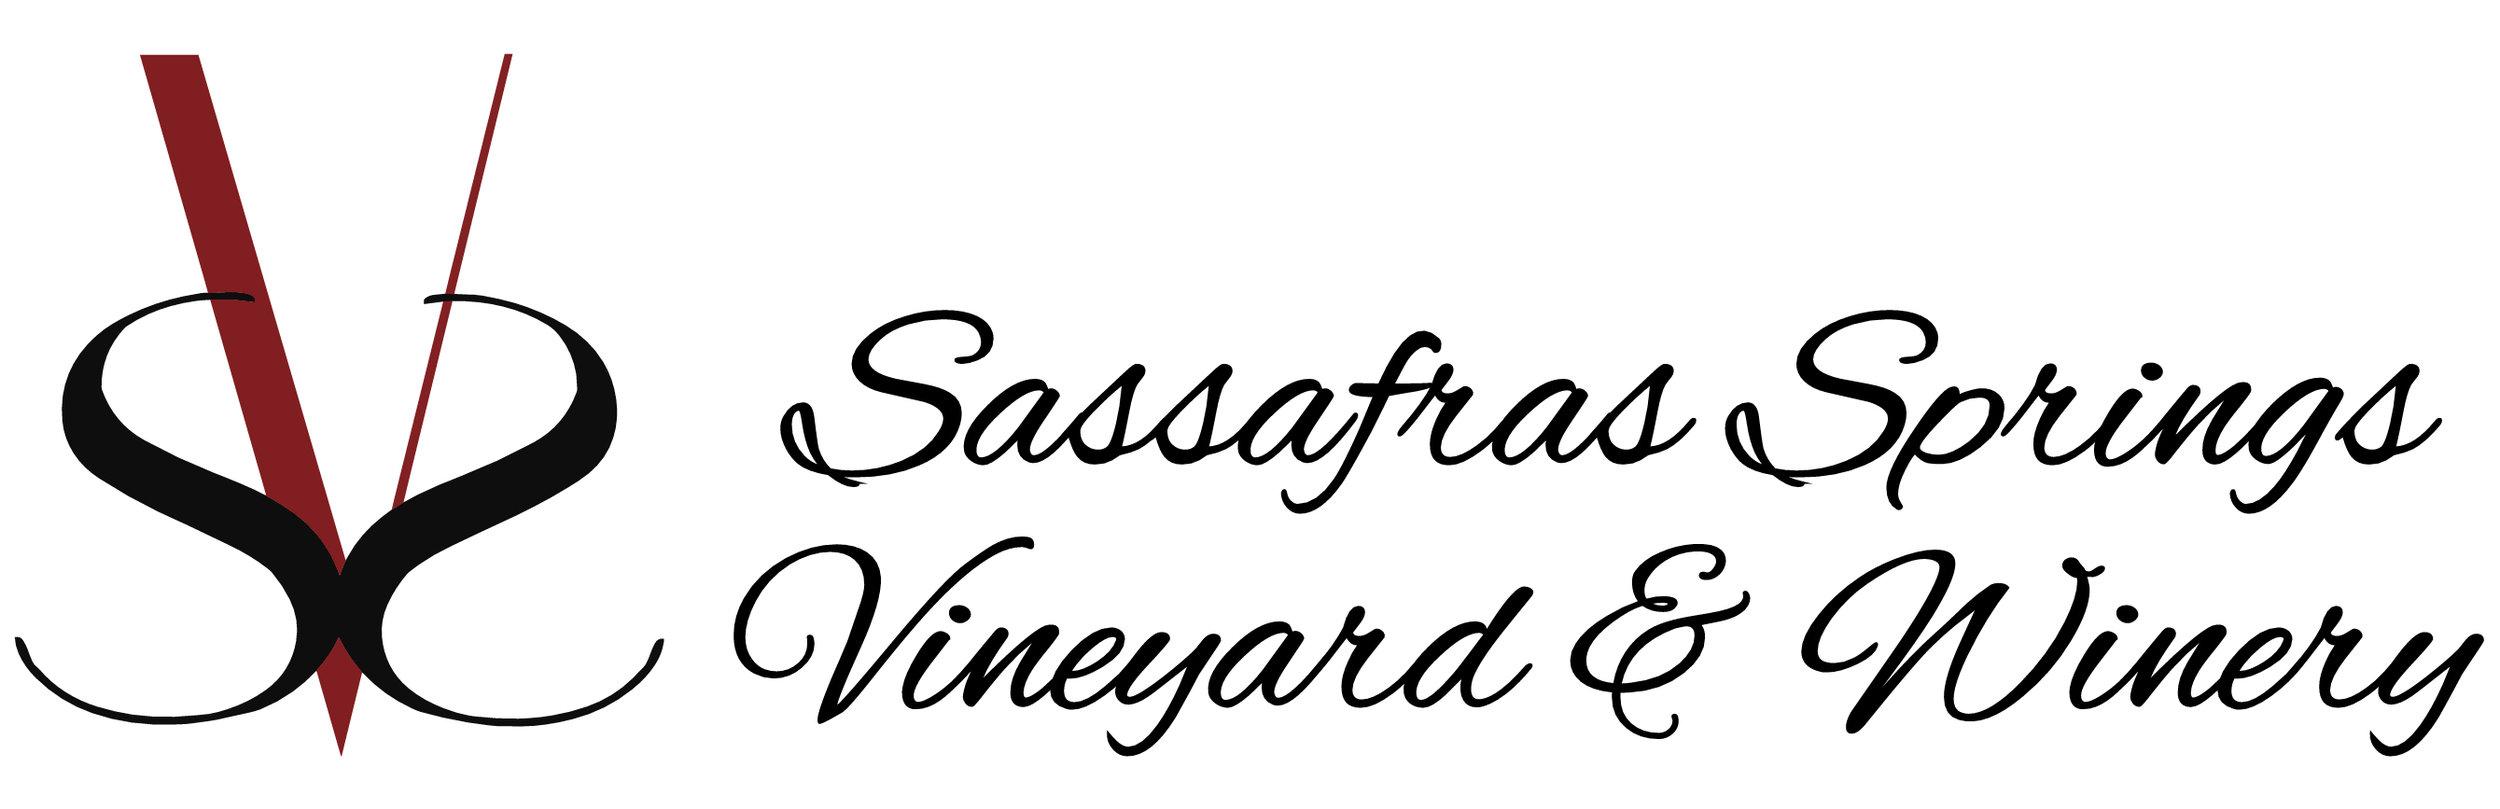 SASS_Logo_Horz_Color-02.jpg